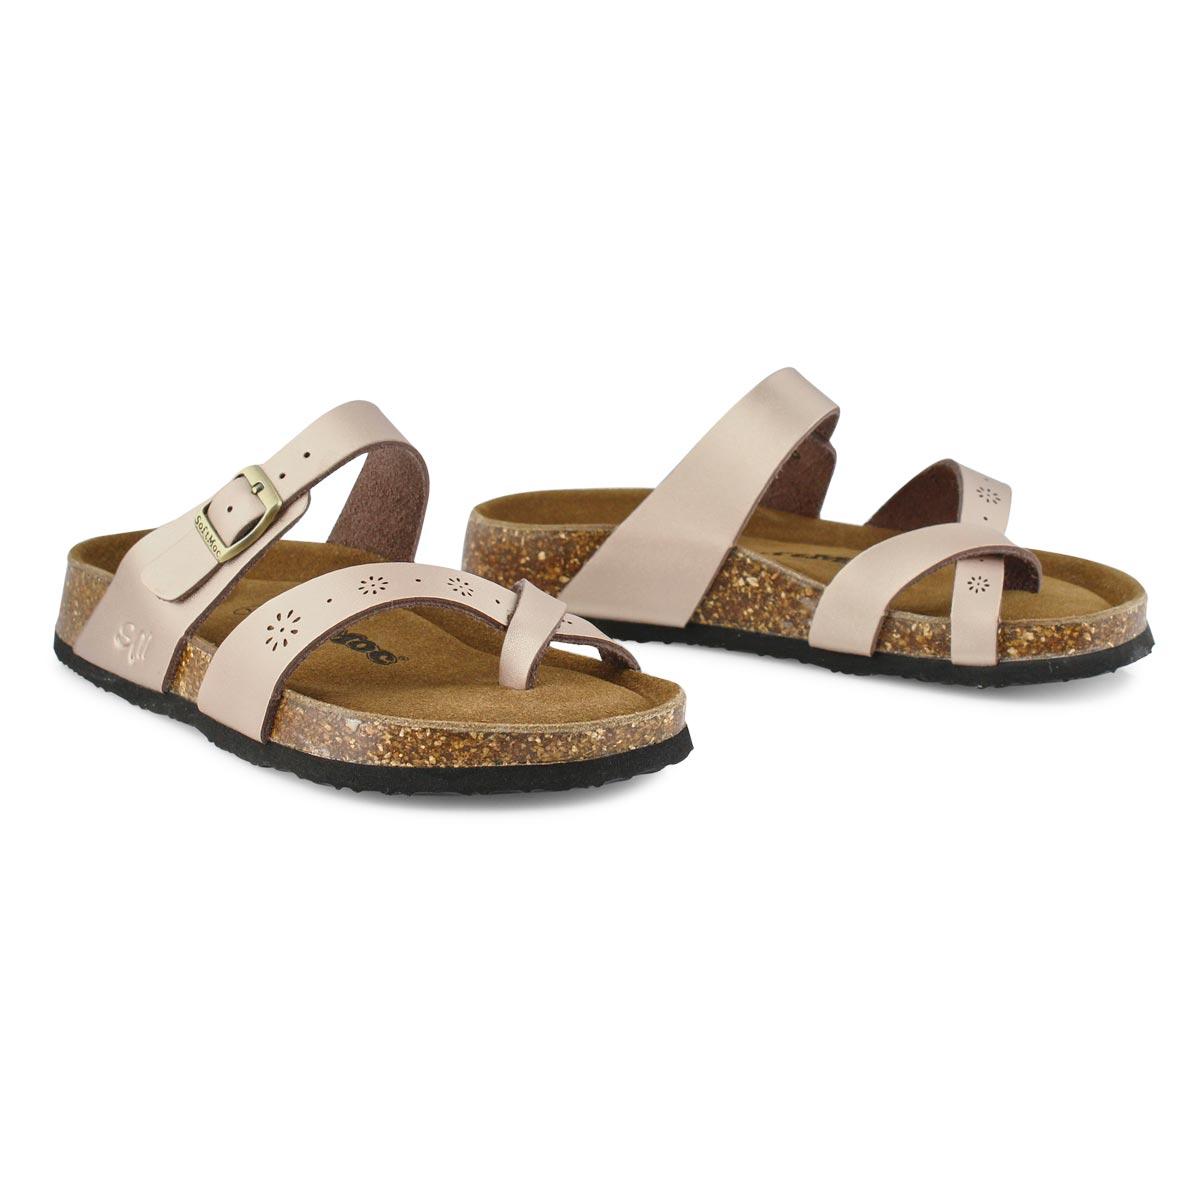 Lds Alicia 5 rse gld prf mem foam sandal